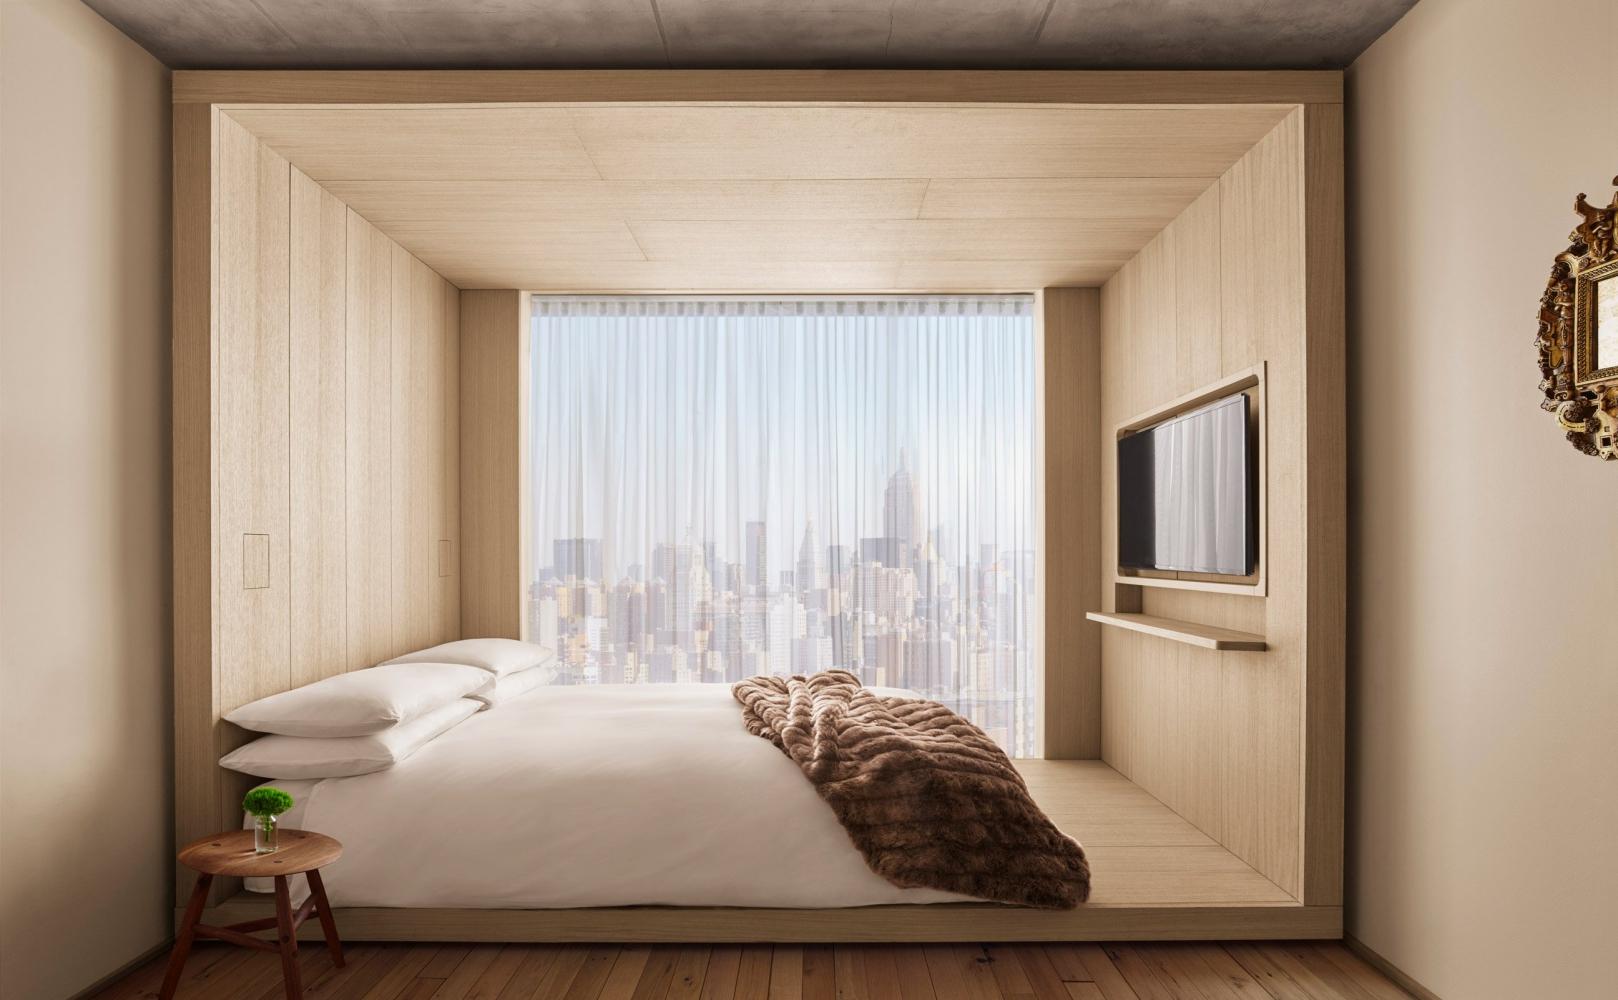 xpublic-hotel-ian-schrager-architecture-hotels-new-york-city-usa-herzog-de-meuron_dezeen_2364_col_5